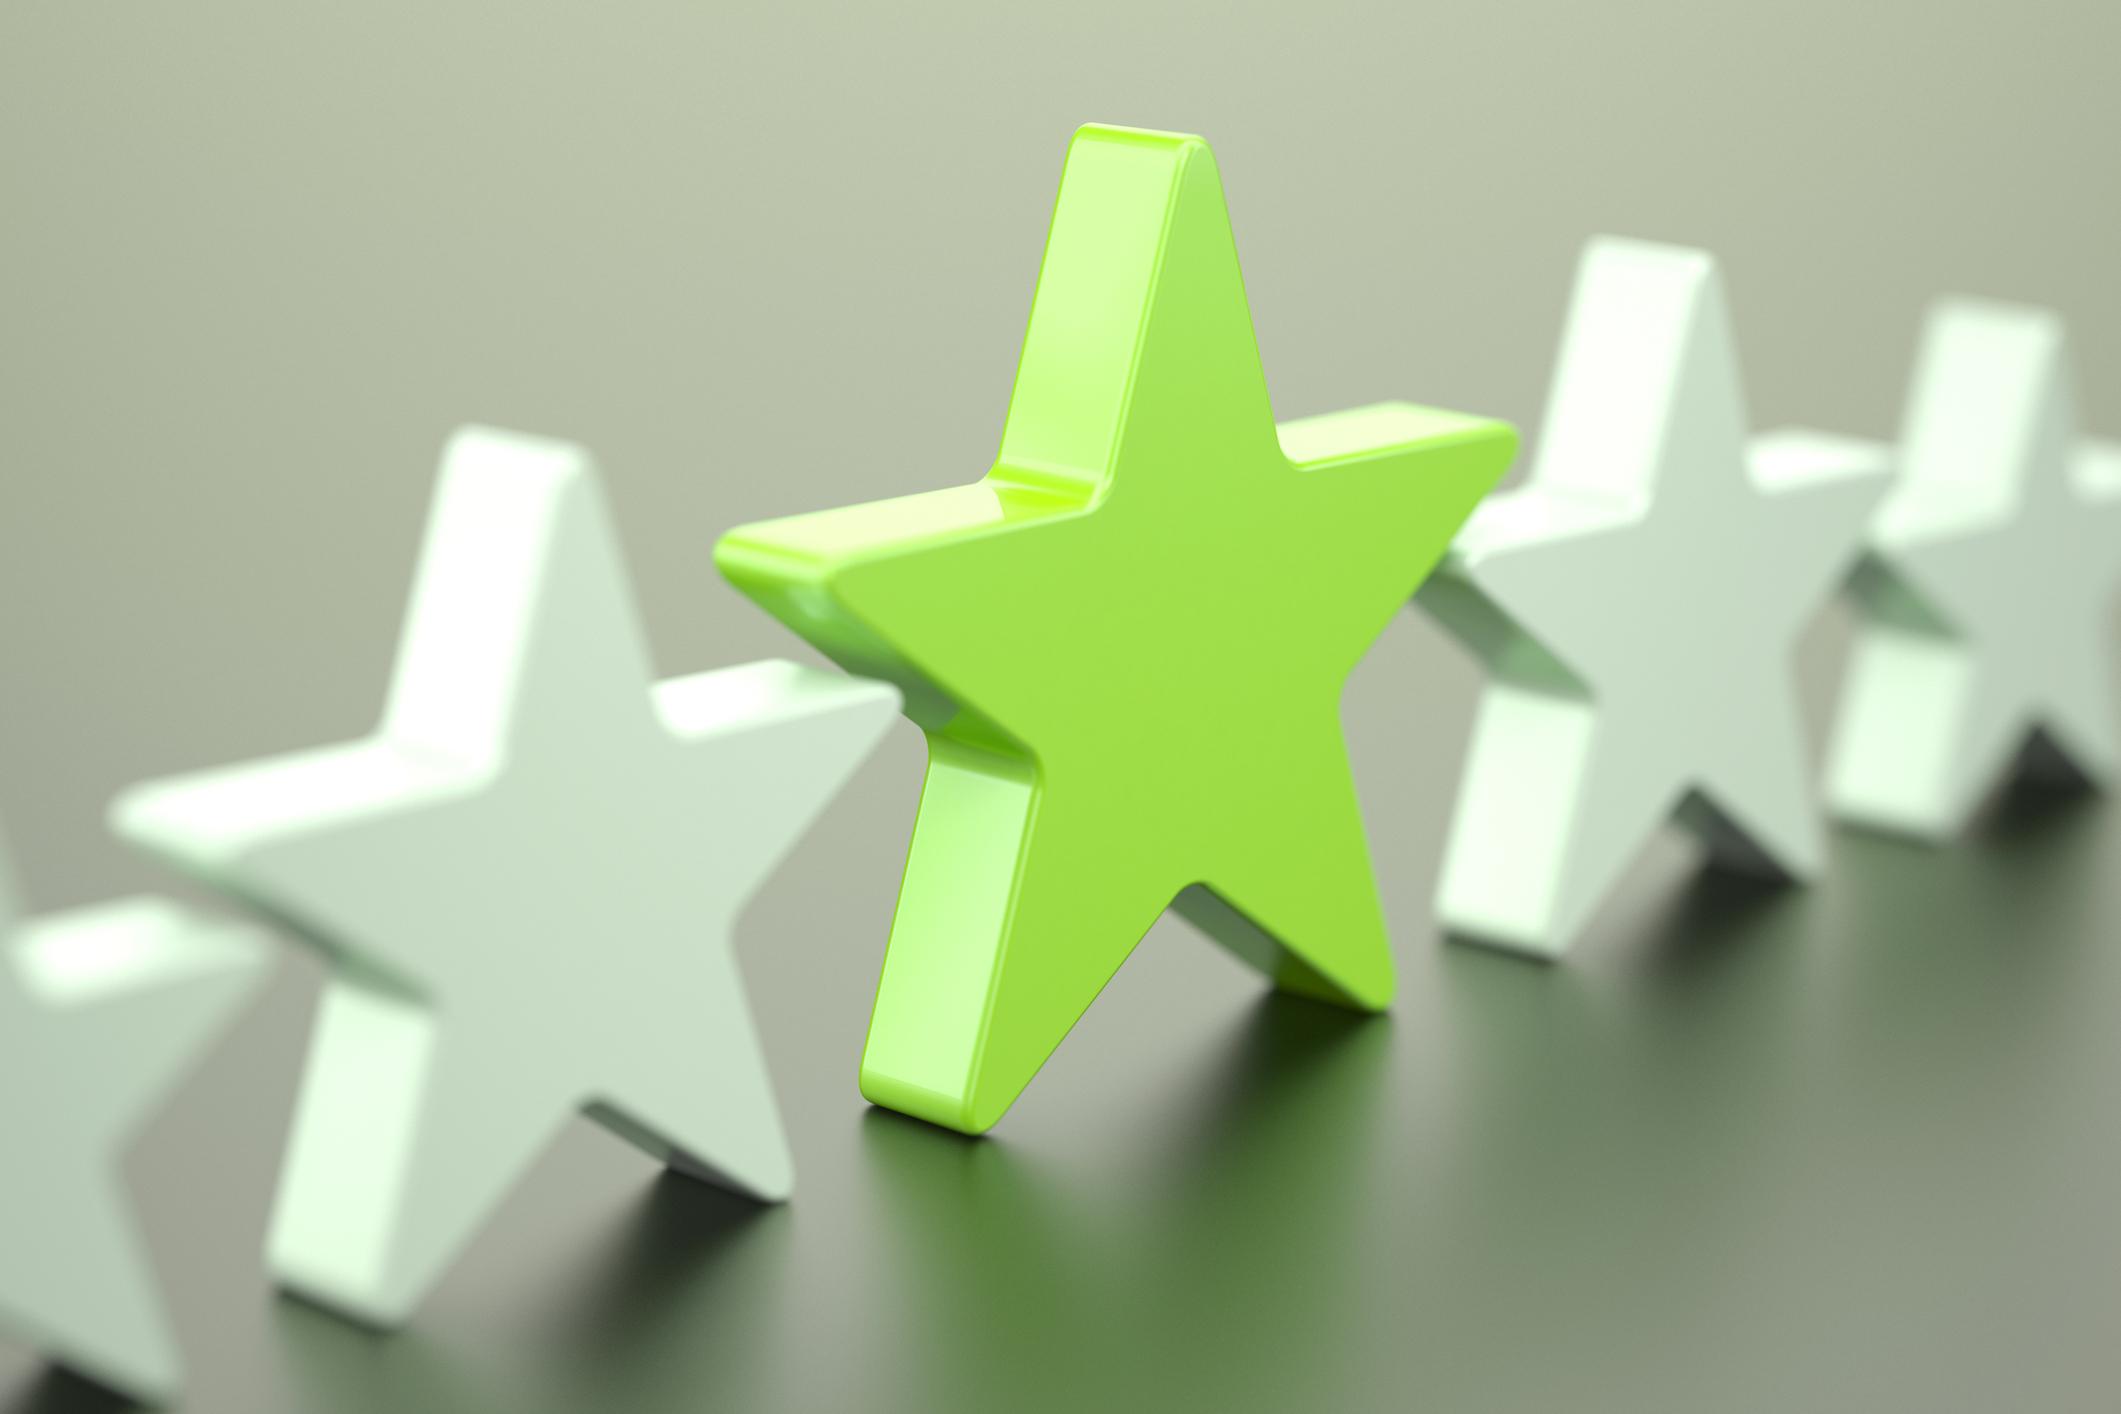 Green and white stars